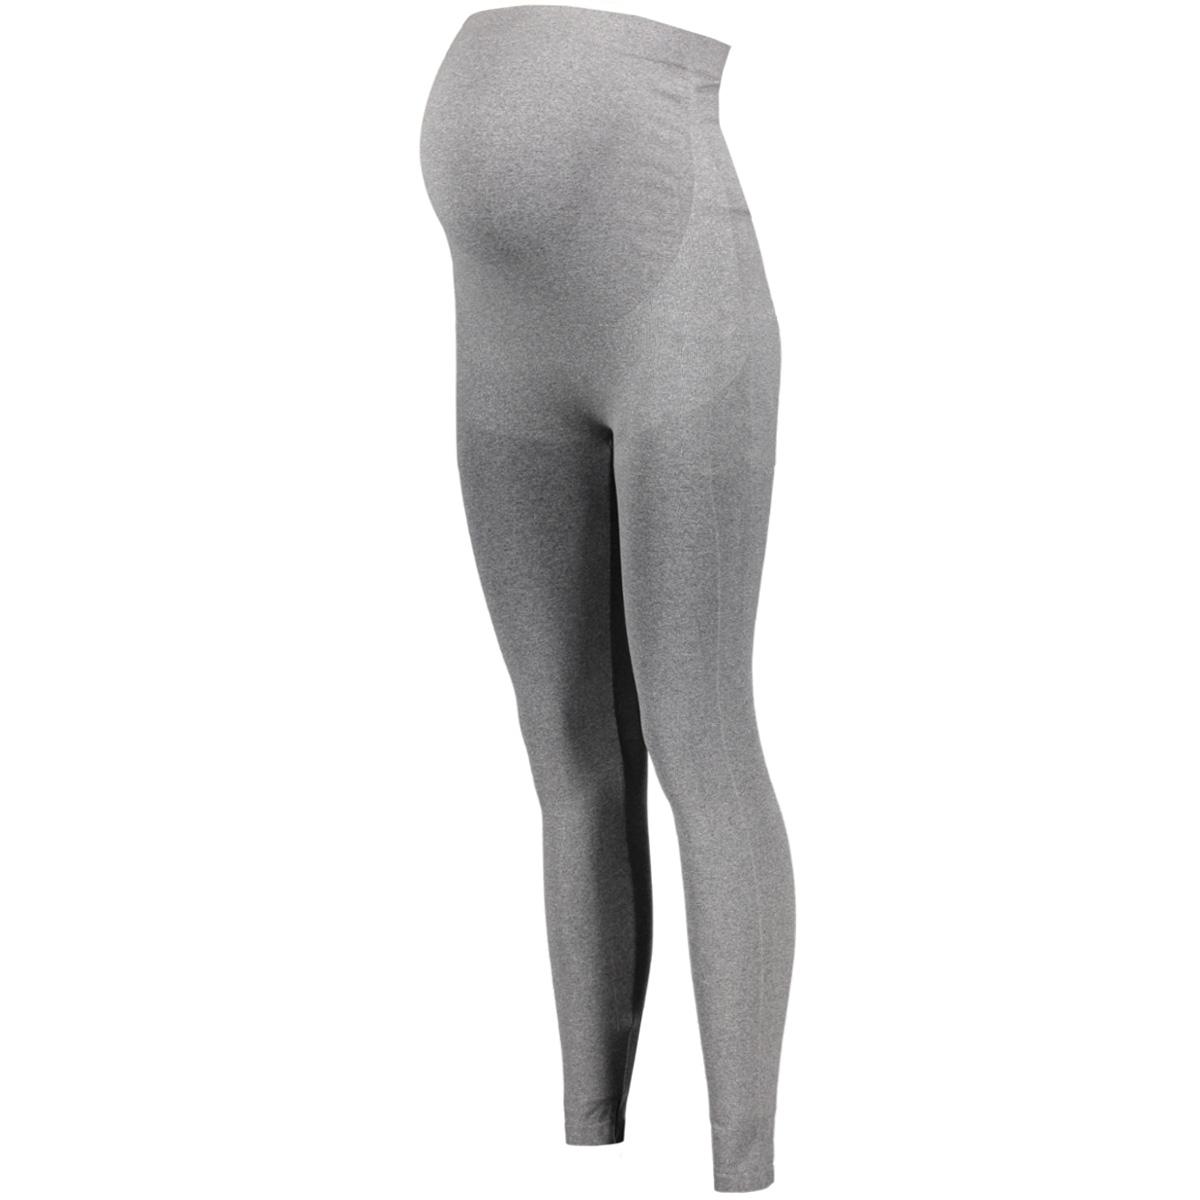 63976 cara legging noppies positie broek c246- grey melange